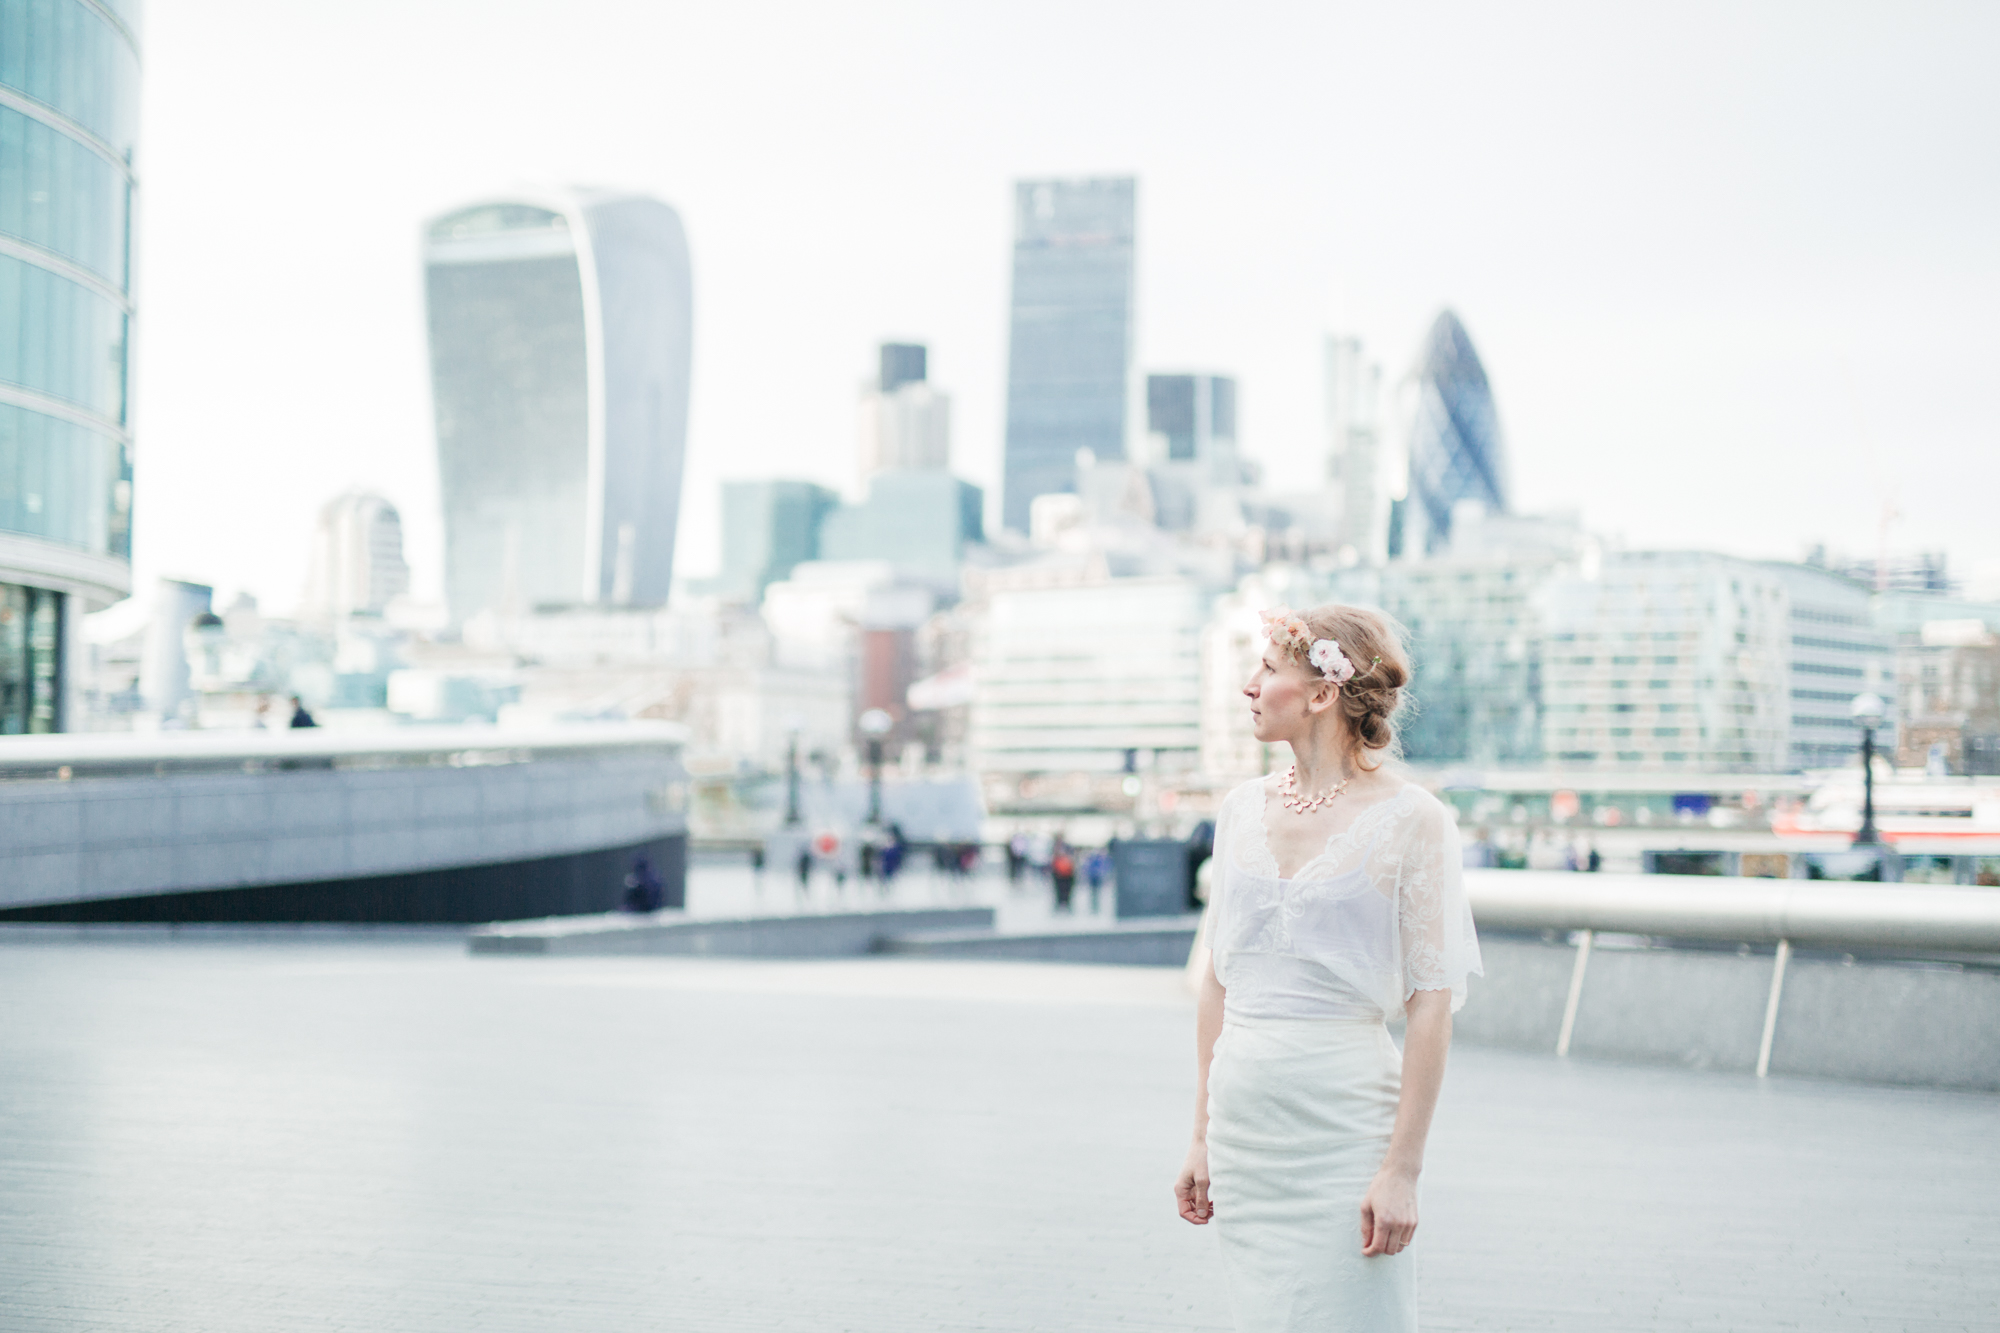 weddingphotographer_lindarehlin_preweddingphoto_london_SensibleM-58.jpg